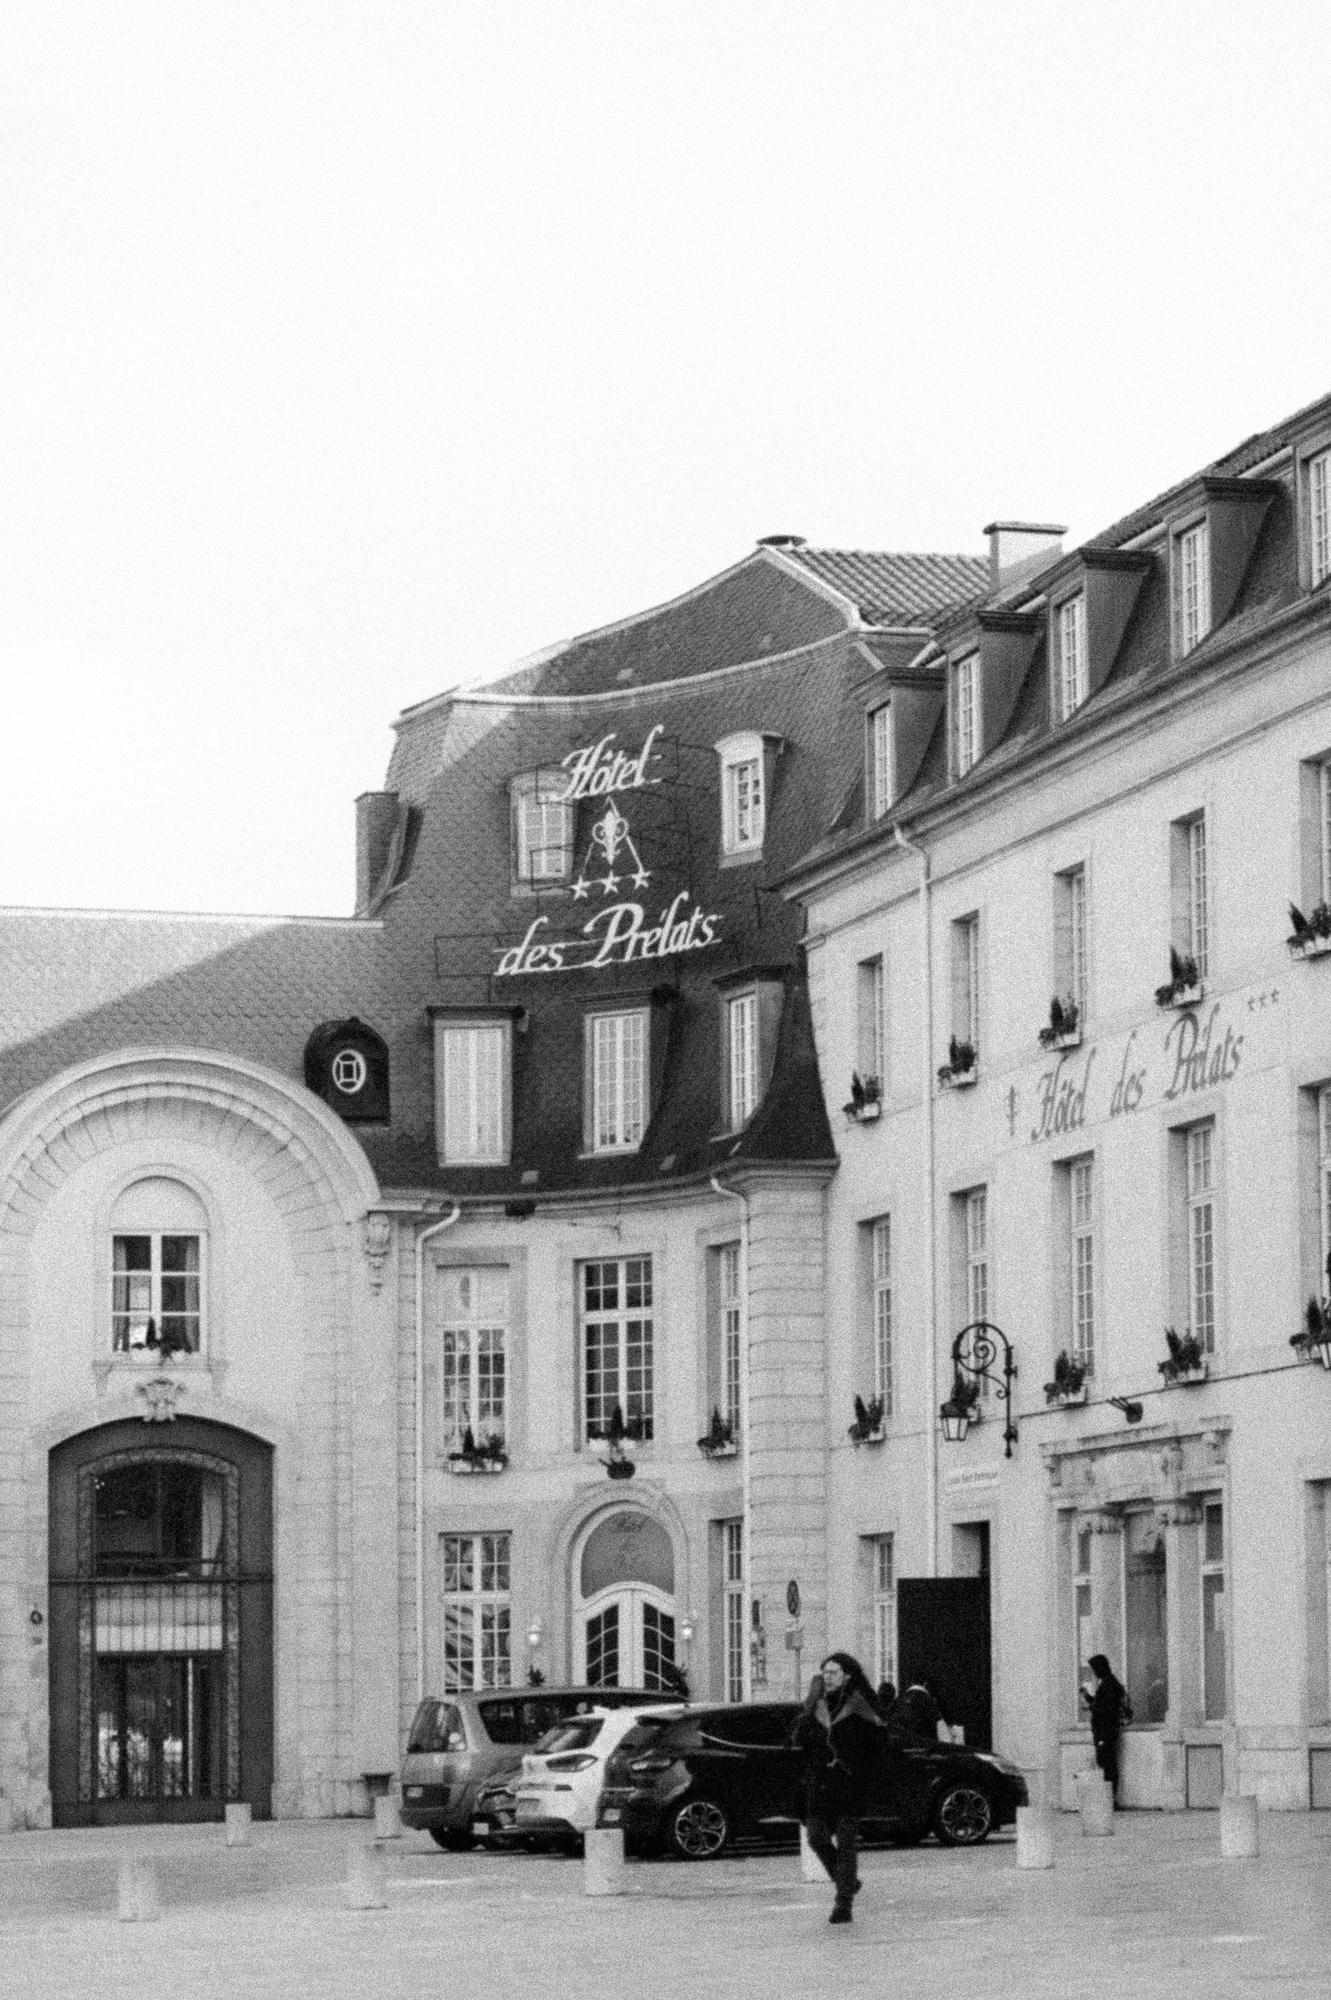 Nancy_France_2019_28.jpg